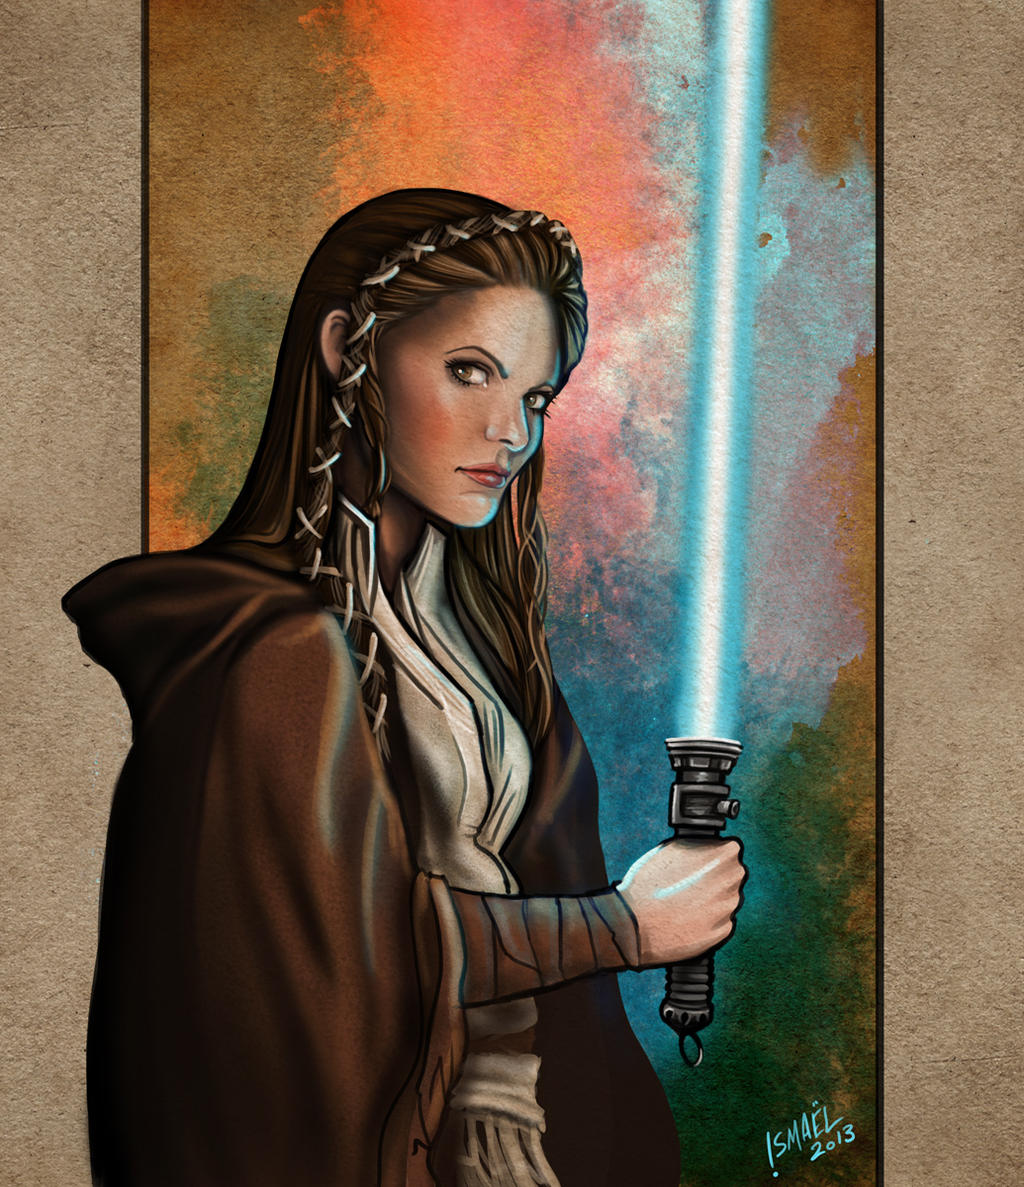 Jaina Leia Solo jedi, Star Wars episode 7 by ismaelArt